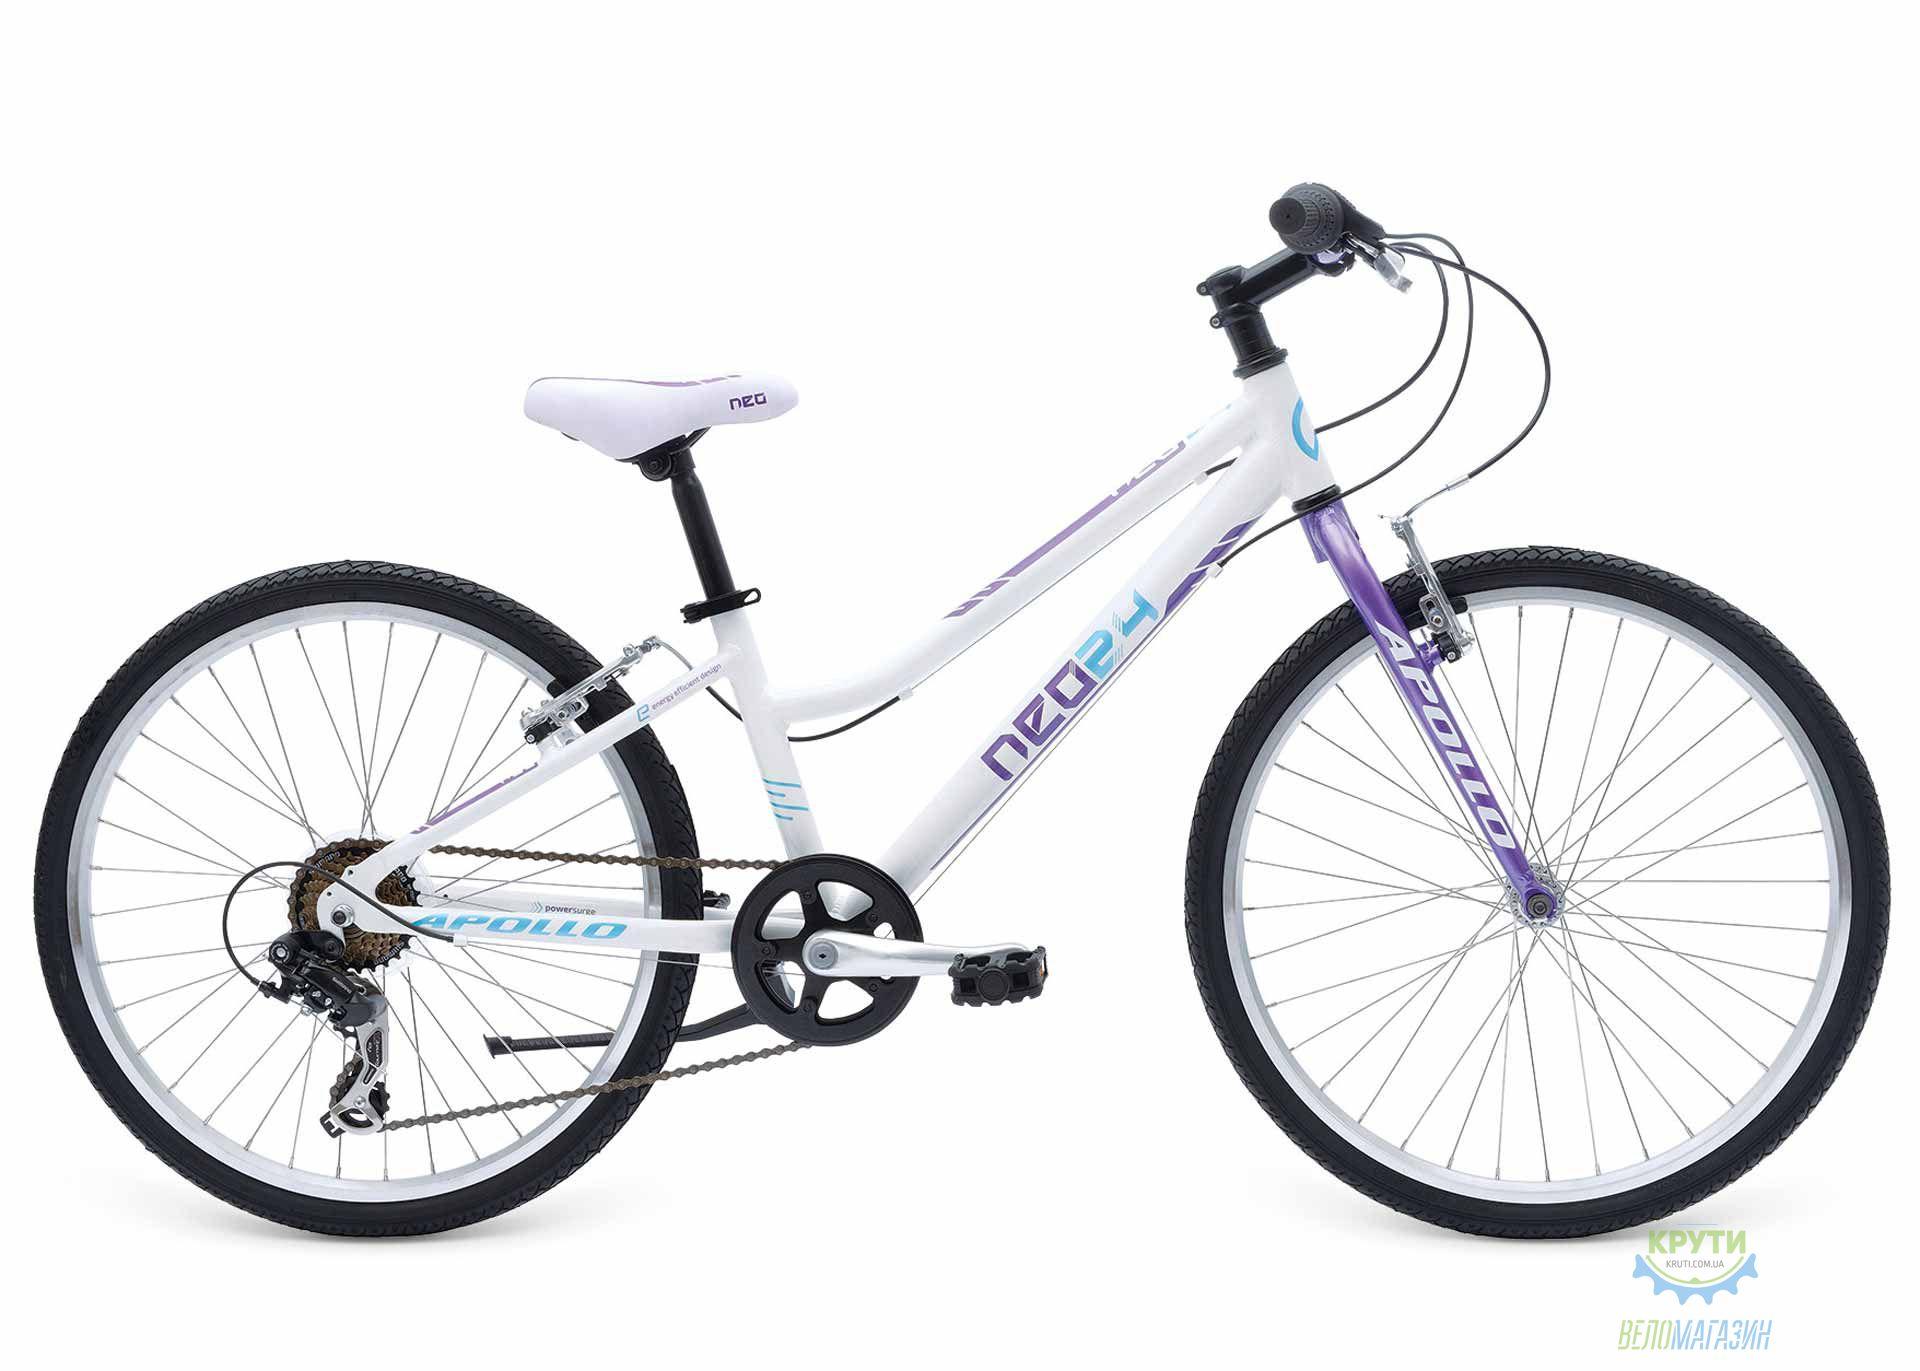 Велосипед 24 APOLLO Neo Girls Geared Gloss White / Gloss Lavender / Gloss Blue 2017